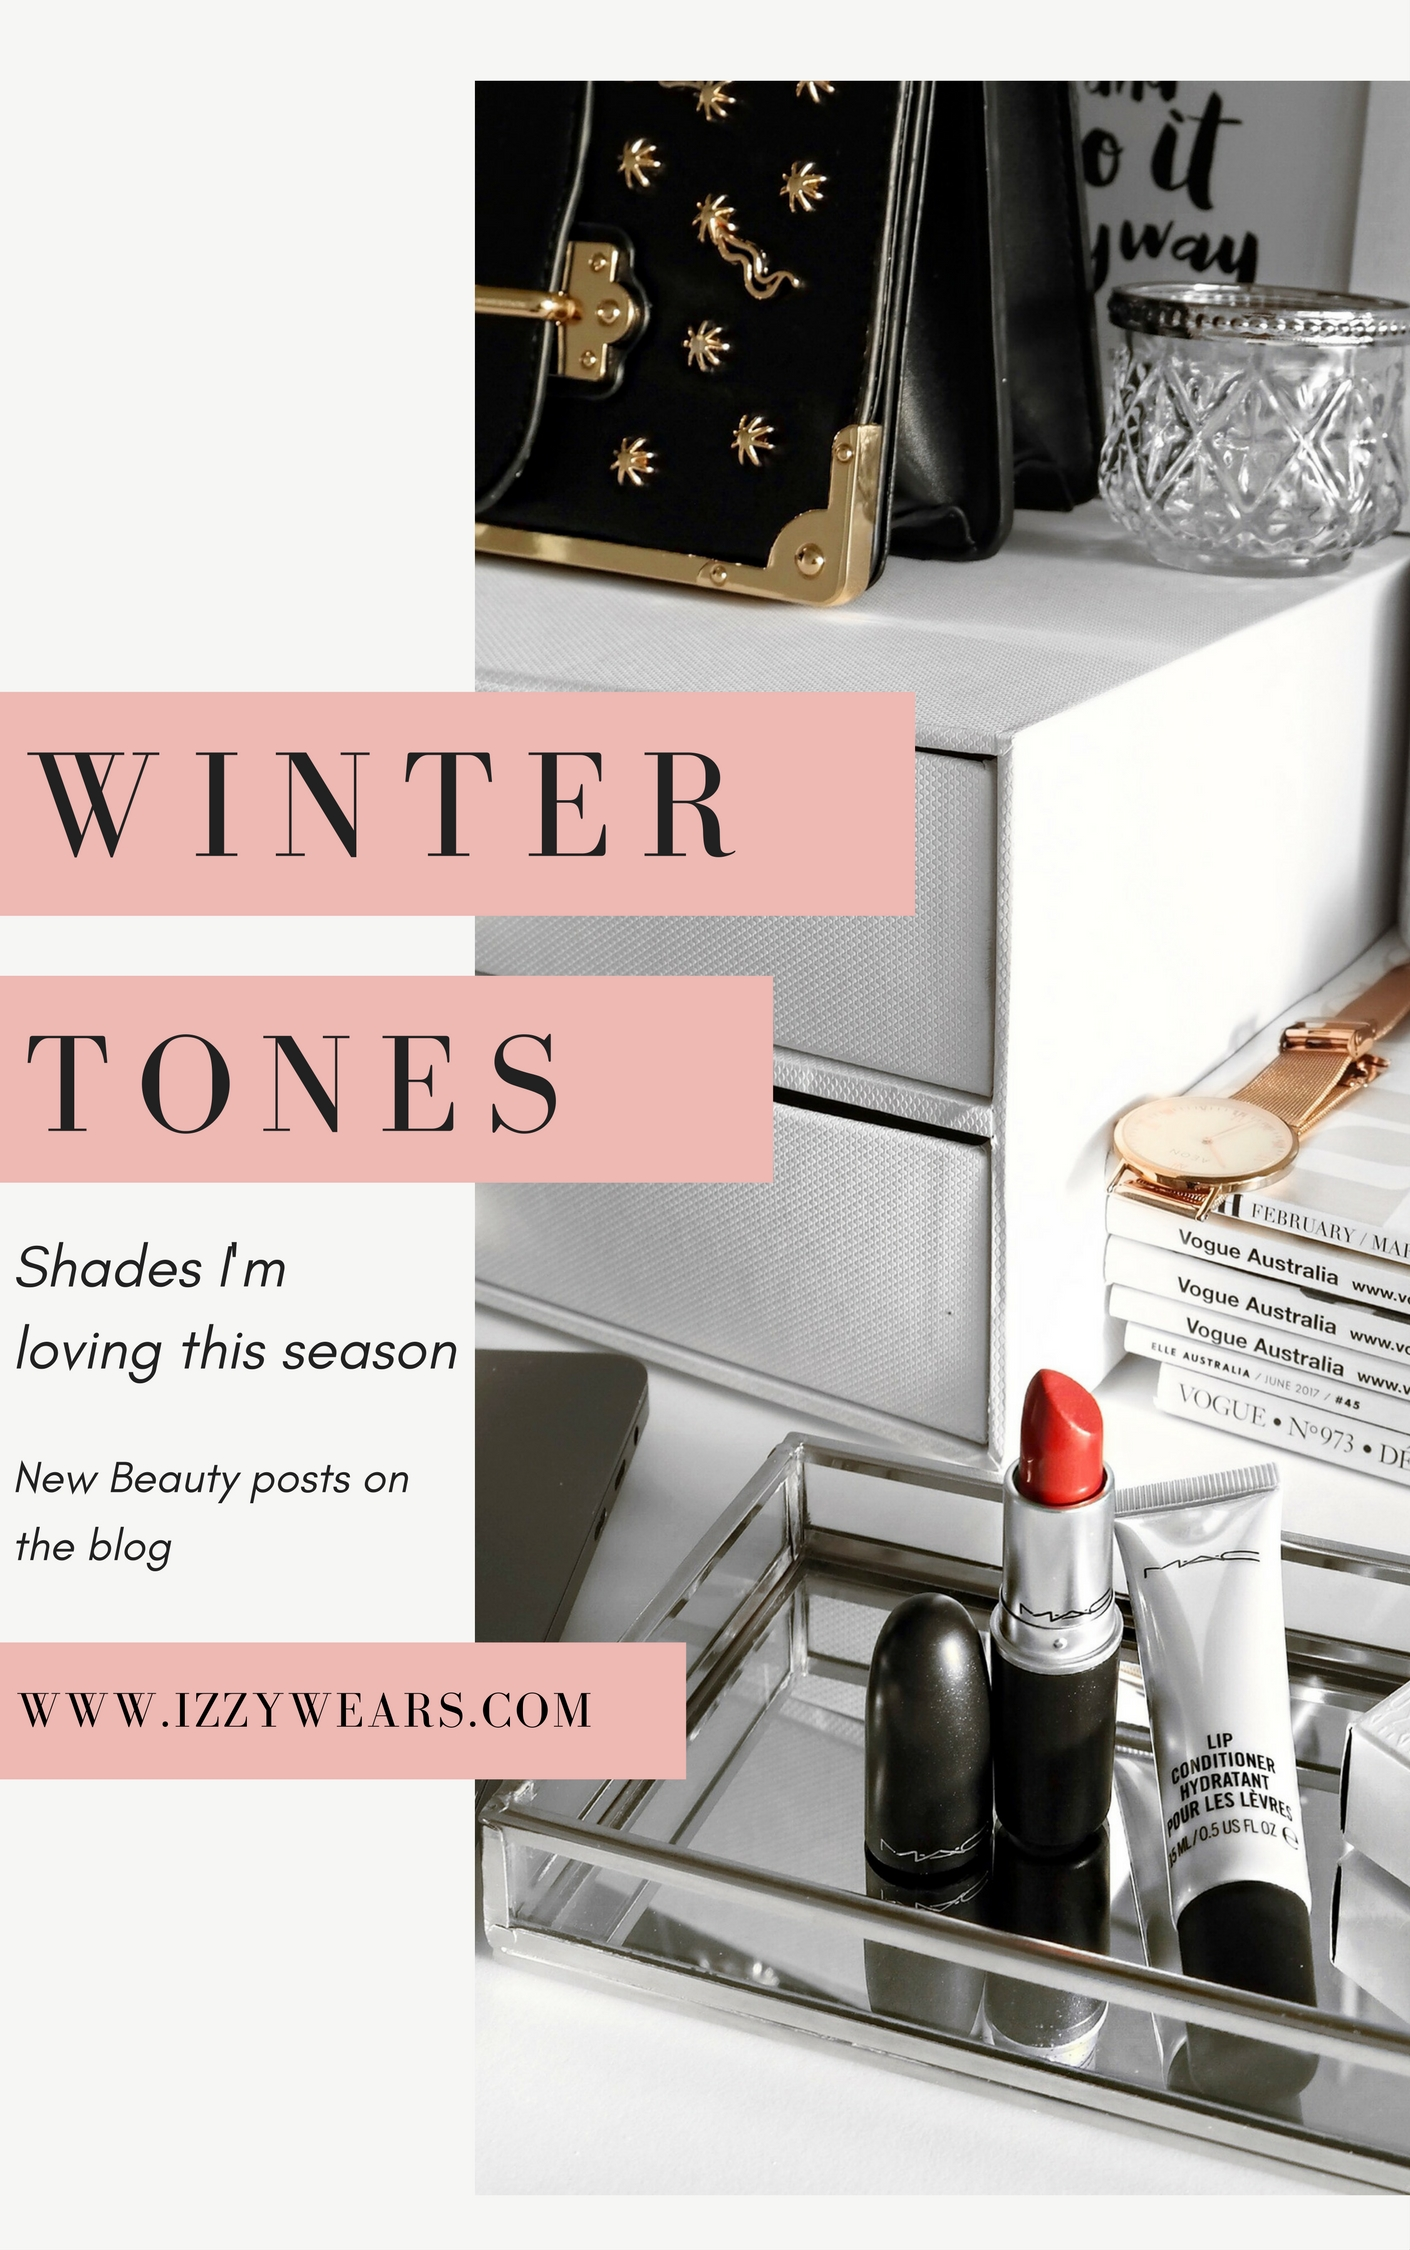 Mac Lipstick new shades | Izzy Wears Blog